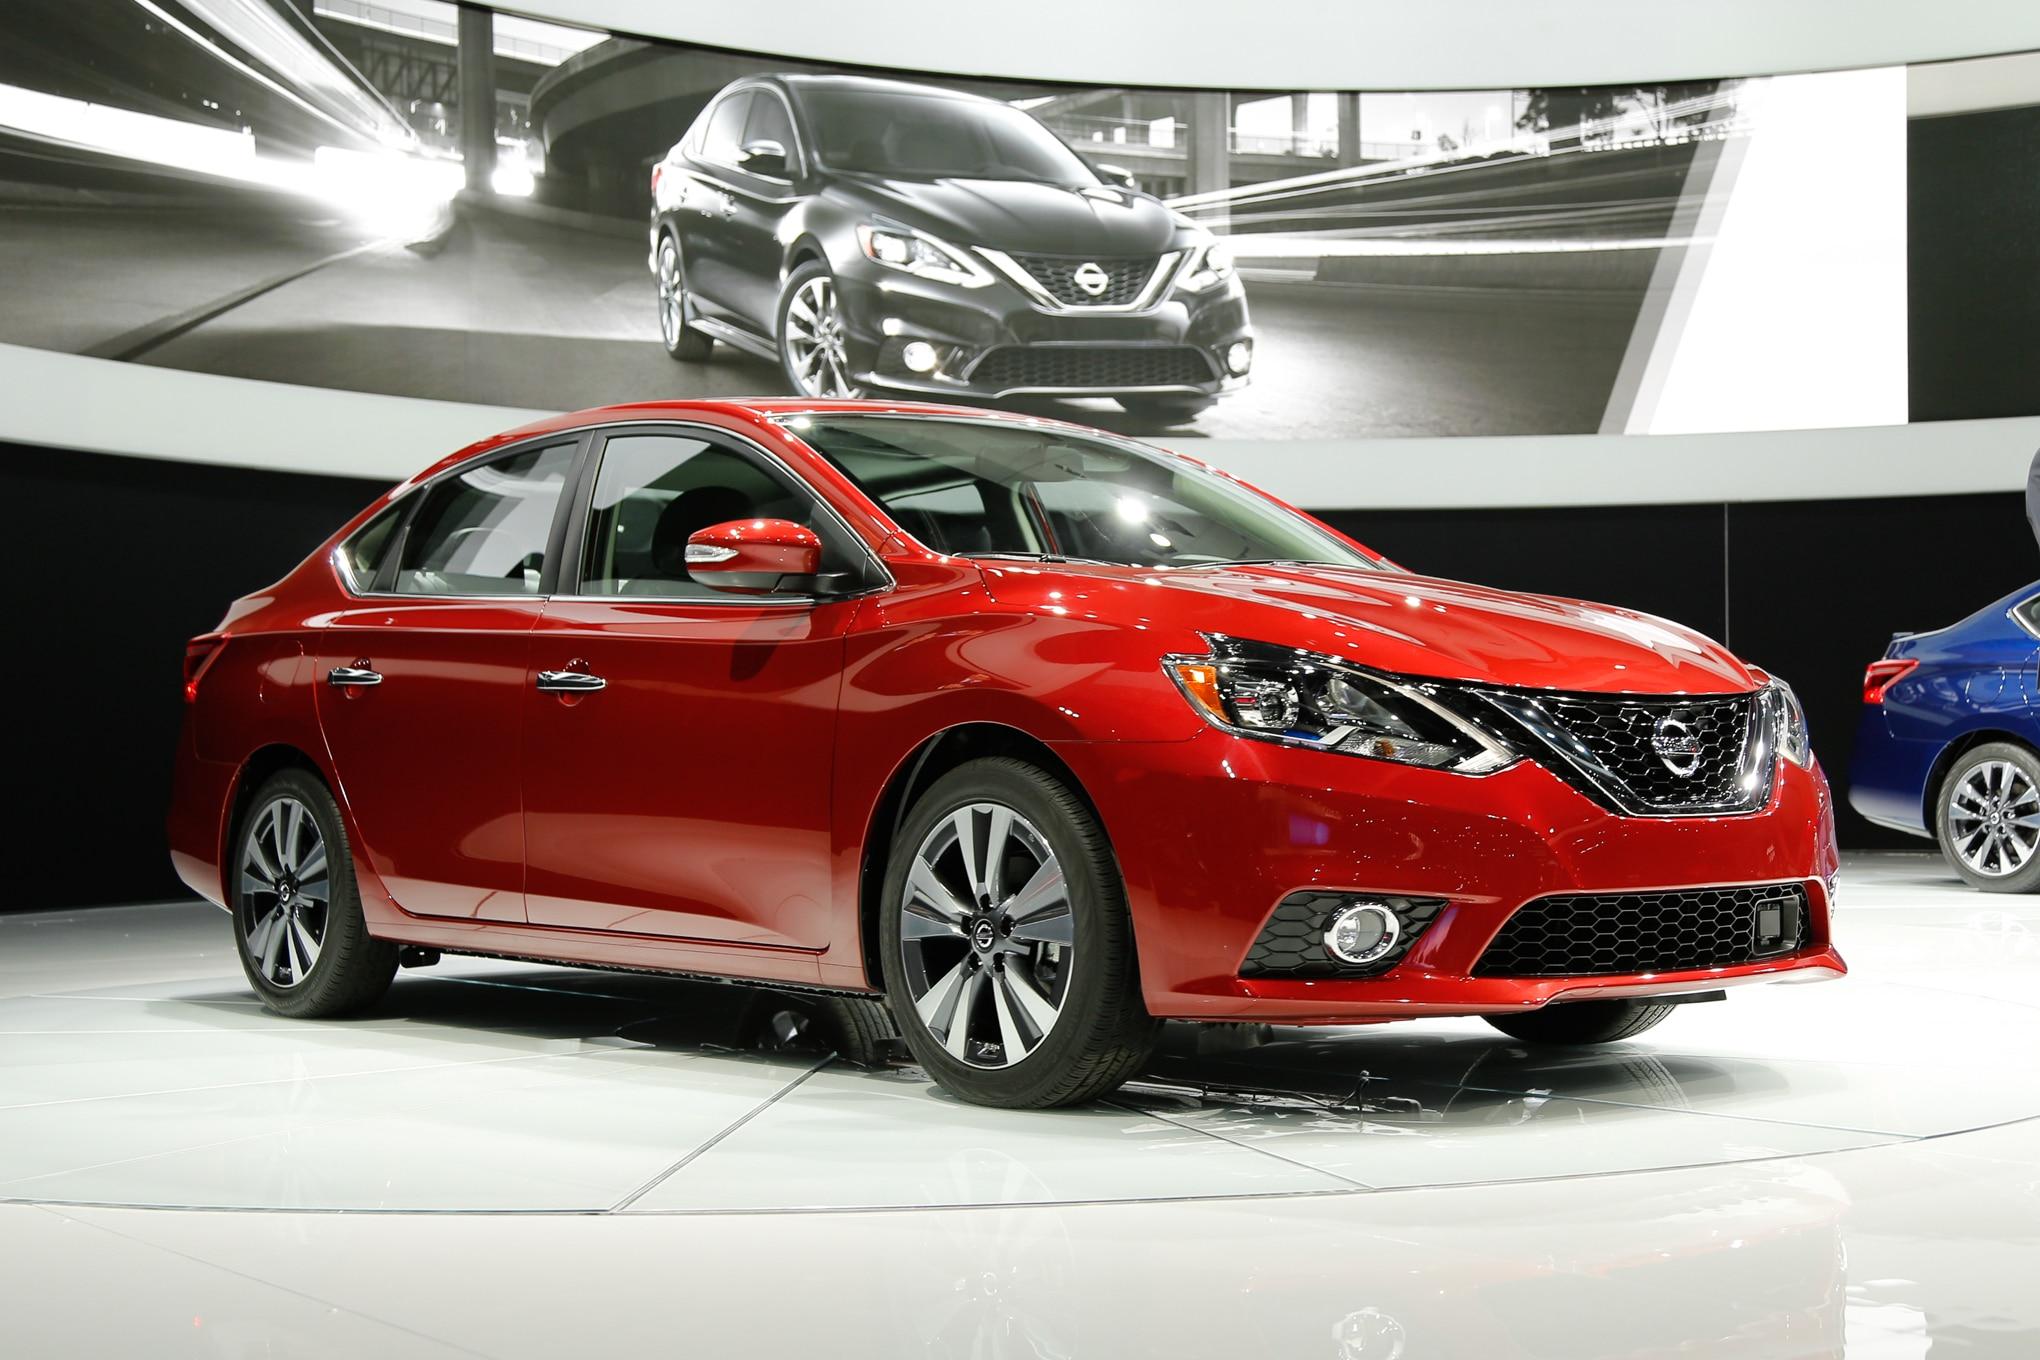 2016 Nissan Sentra Pricing Rises $200-$1,450